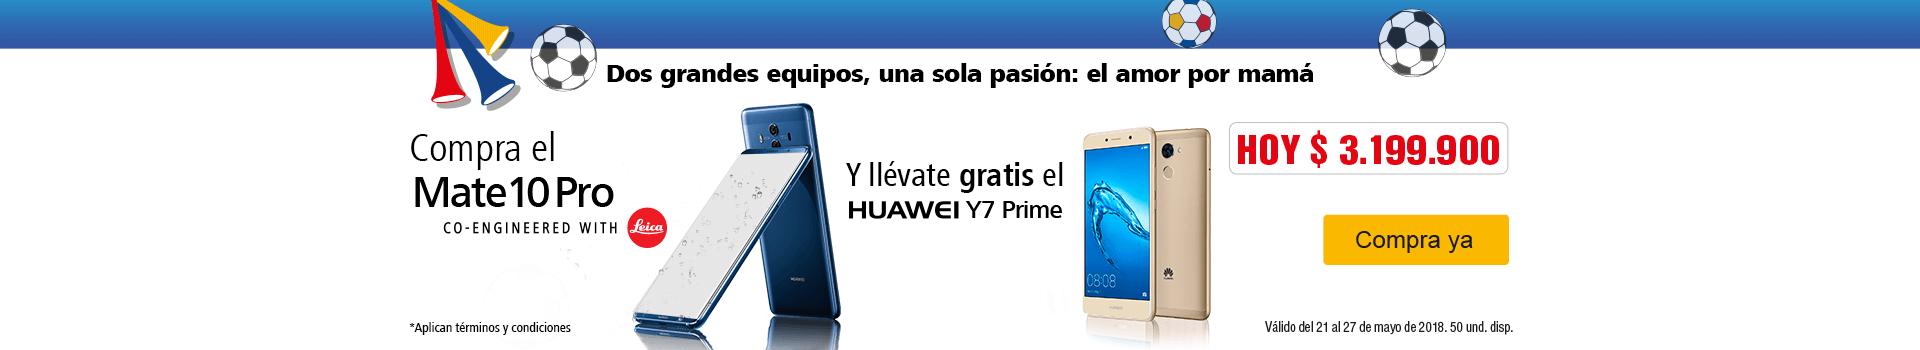 AK-KT-BCAT-4-celulares-LNZ-EXPM-Huawei-KasadoMate10Pro-May26